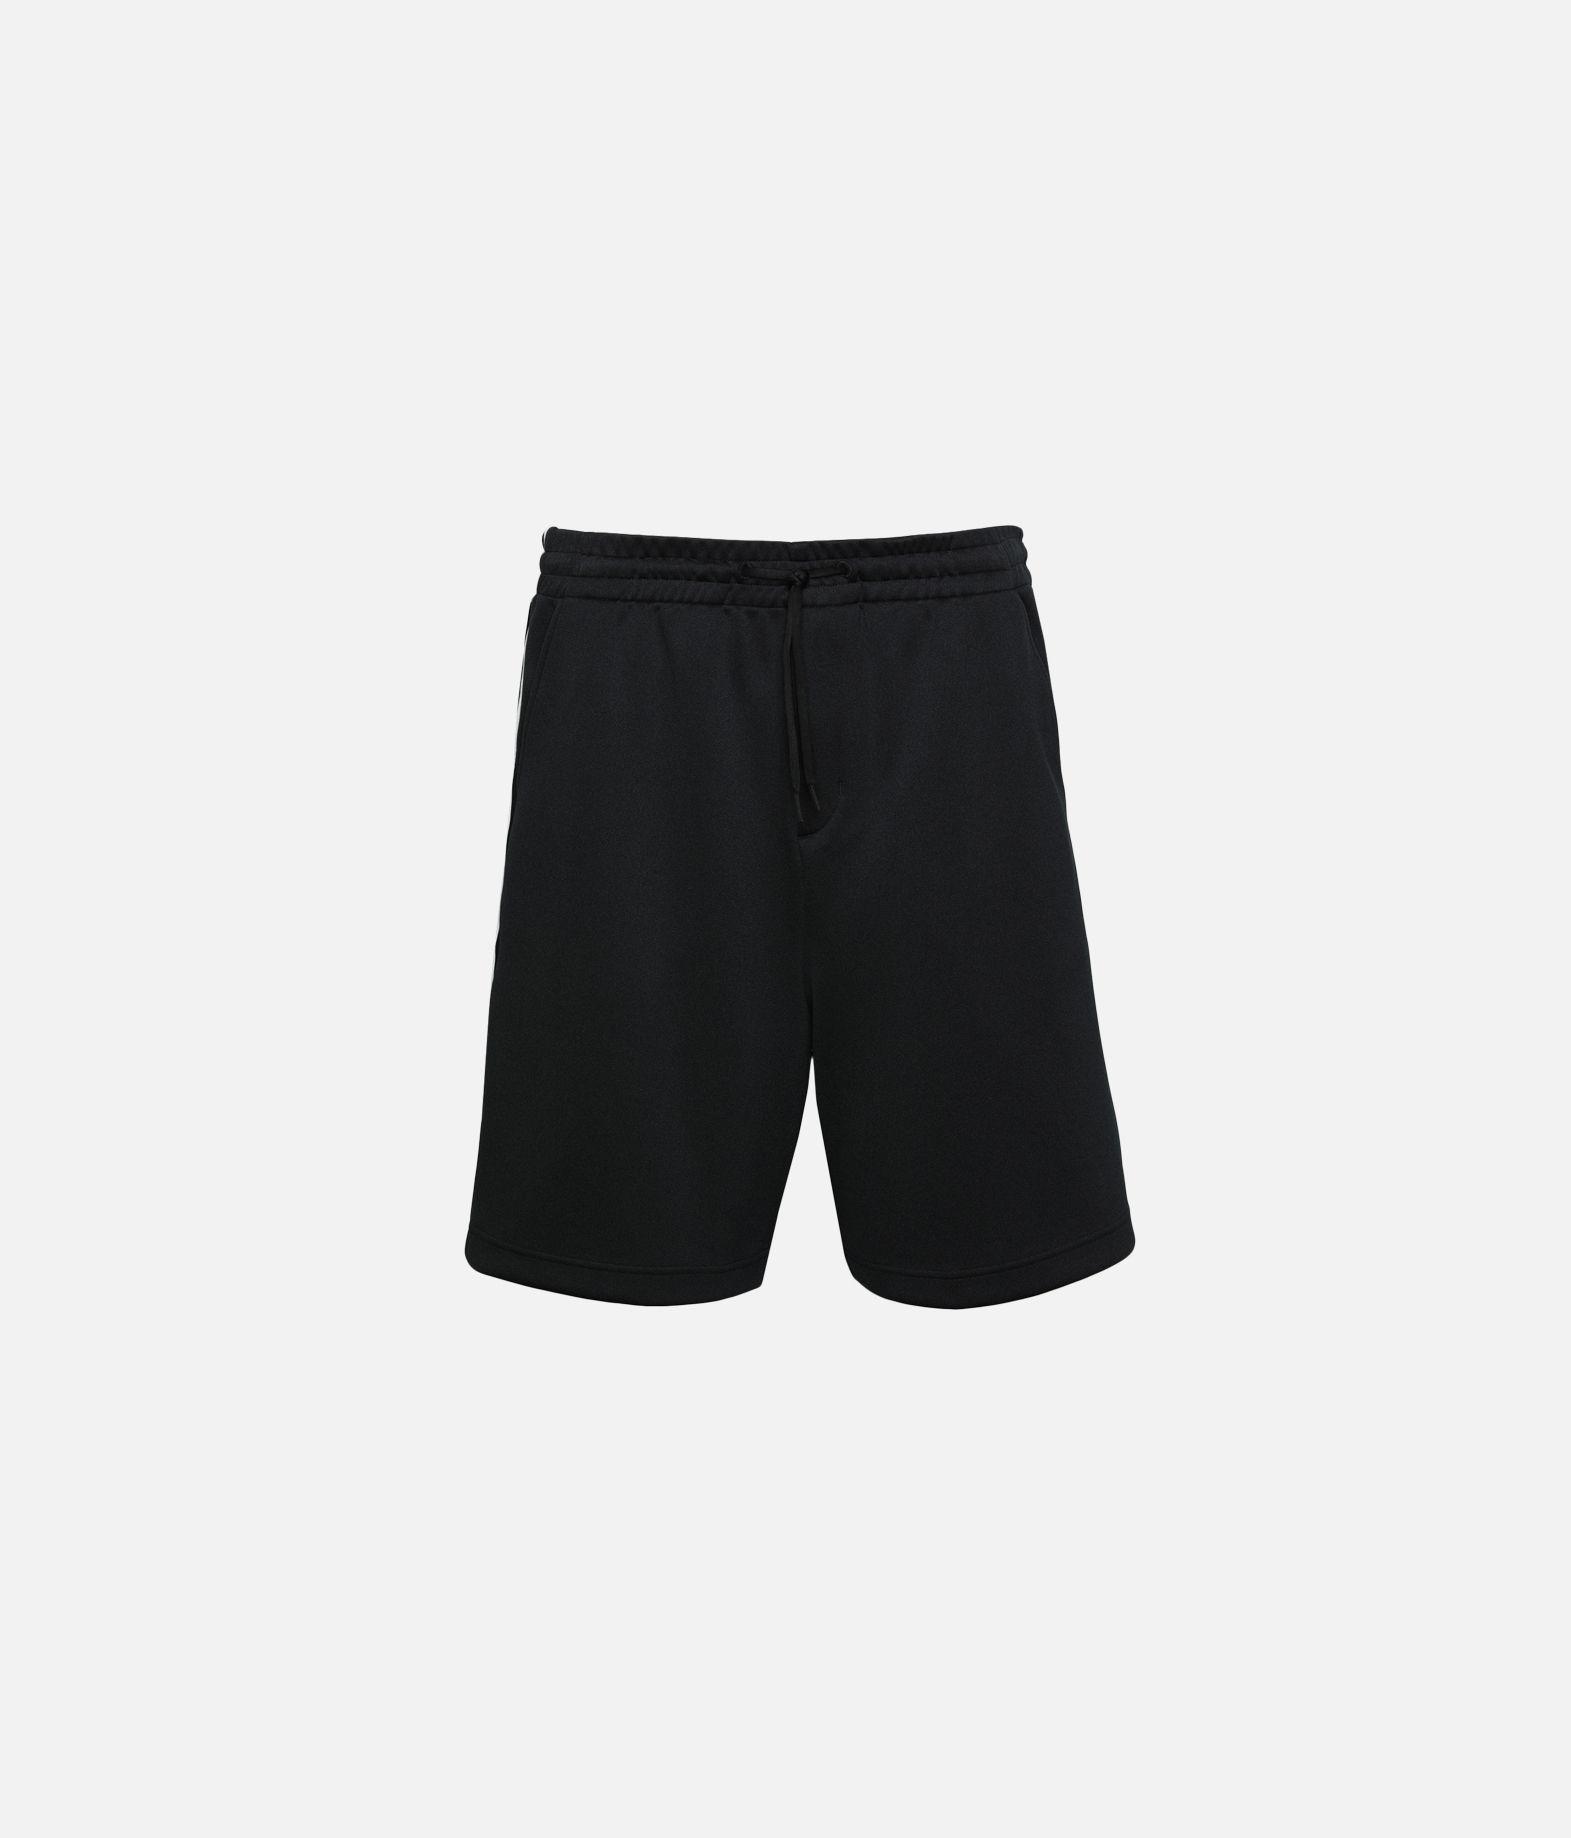 Y-3 Y-3 3-Stripes Track Shorts Track pant Herren f